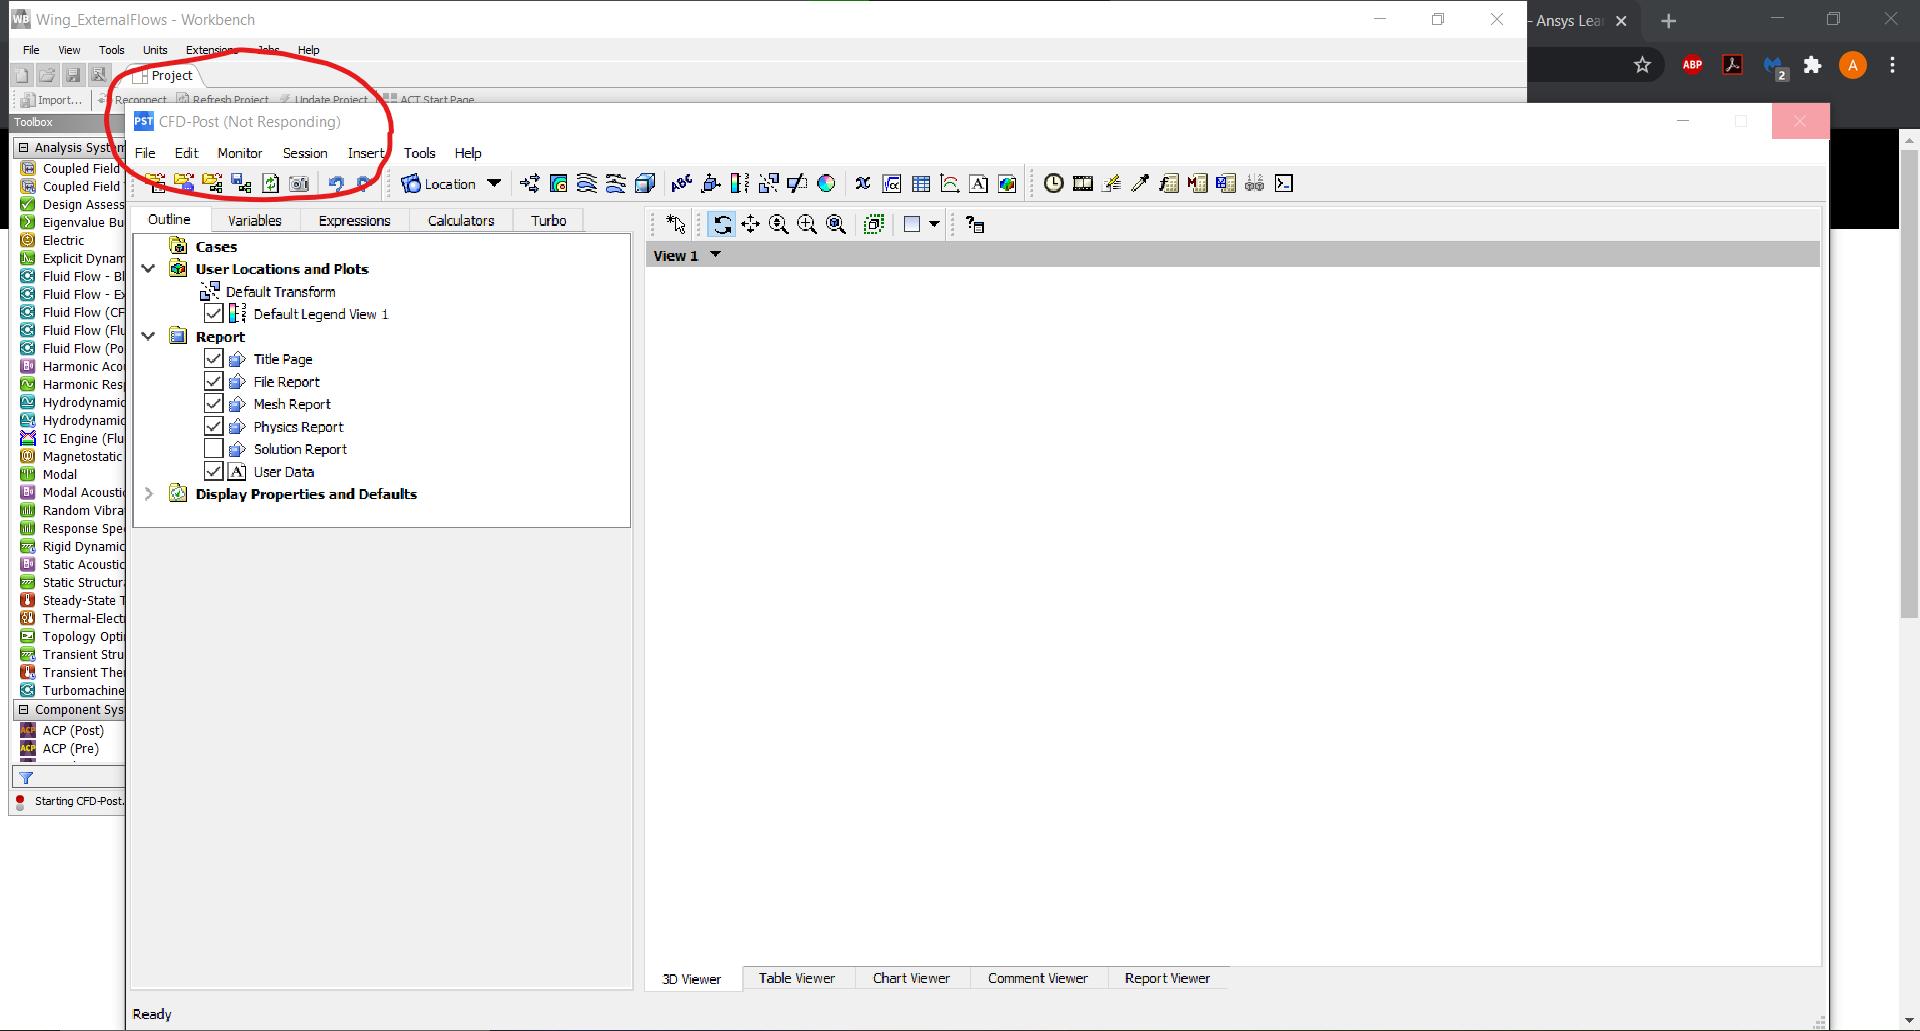 Screenshot 2020-10-21 175237.png